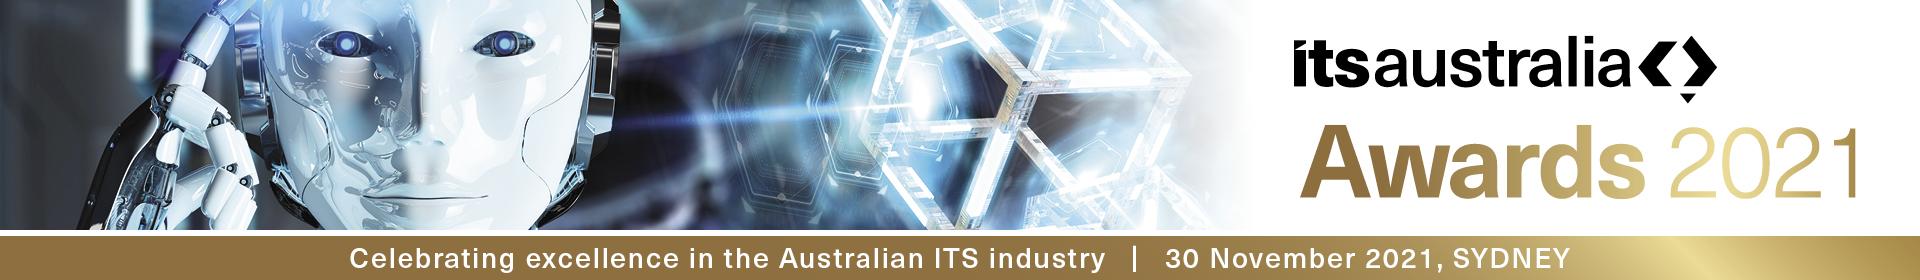 ITS Australia Awards 2021